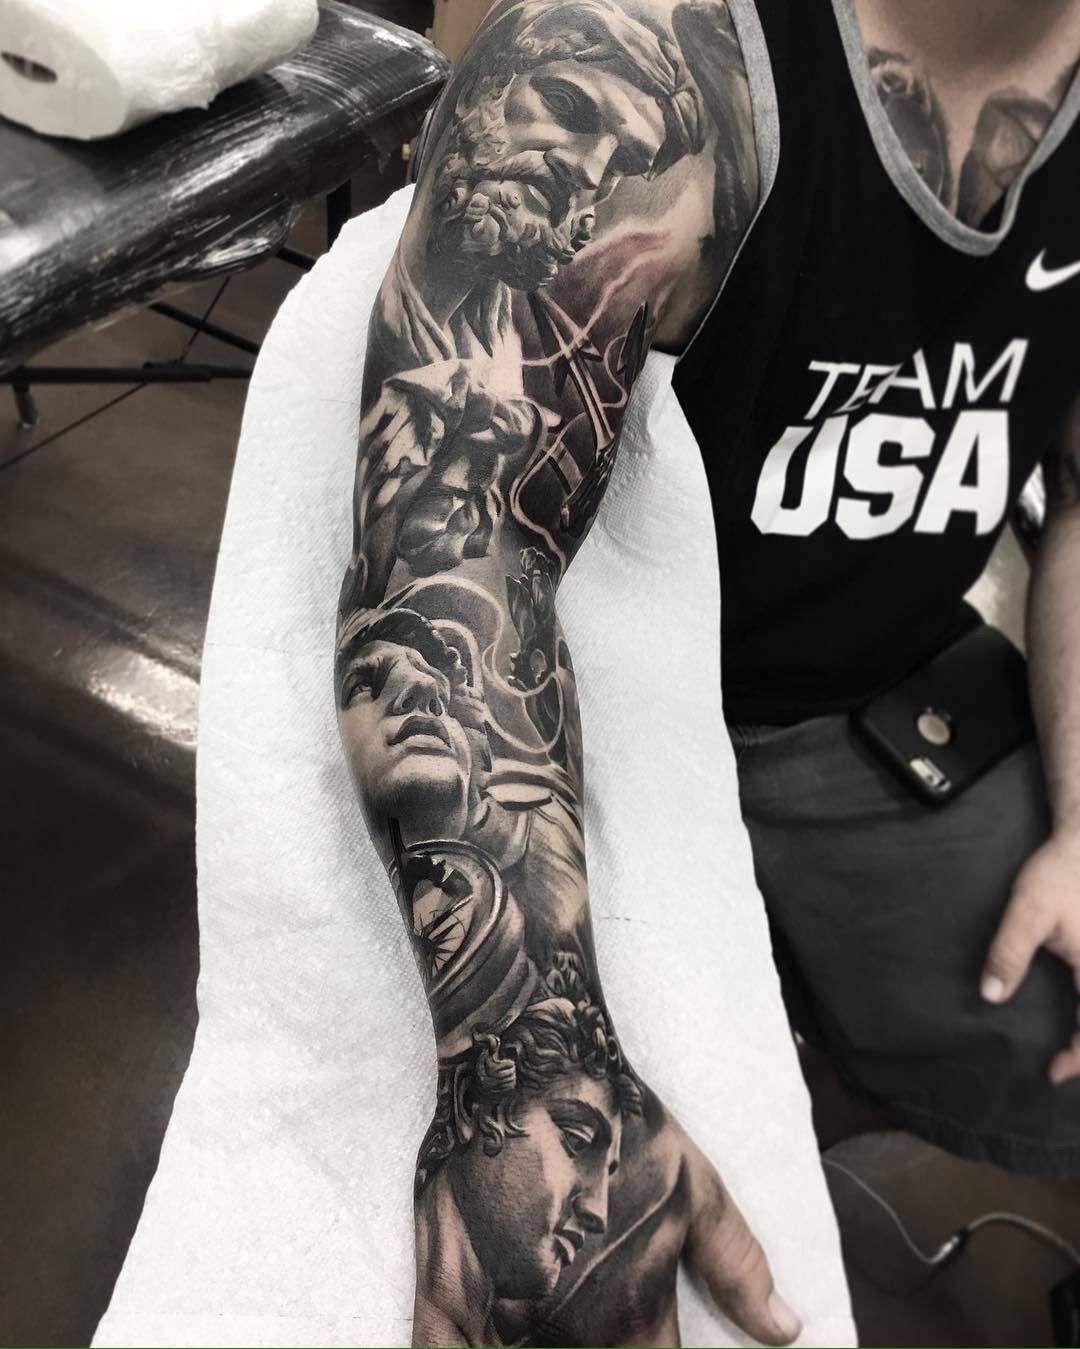 Pin By Drayton Weidner On Tattoos Pinterest Tatuajes Mangas